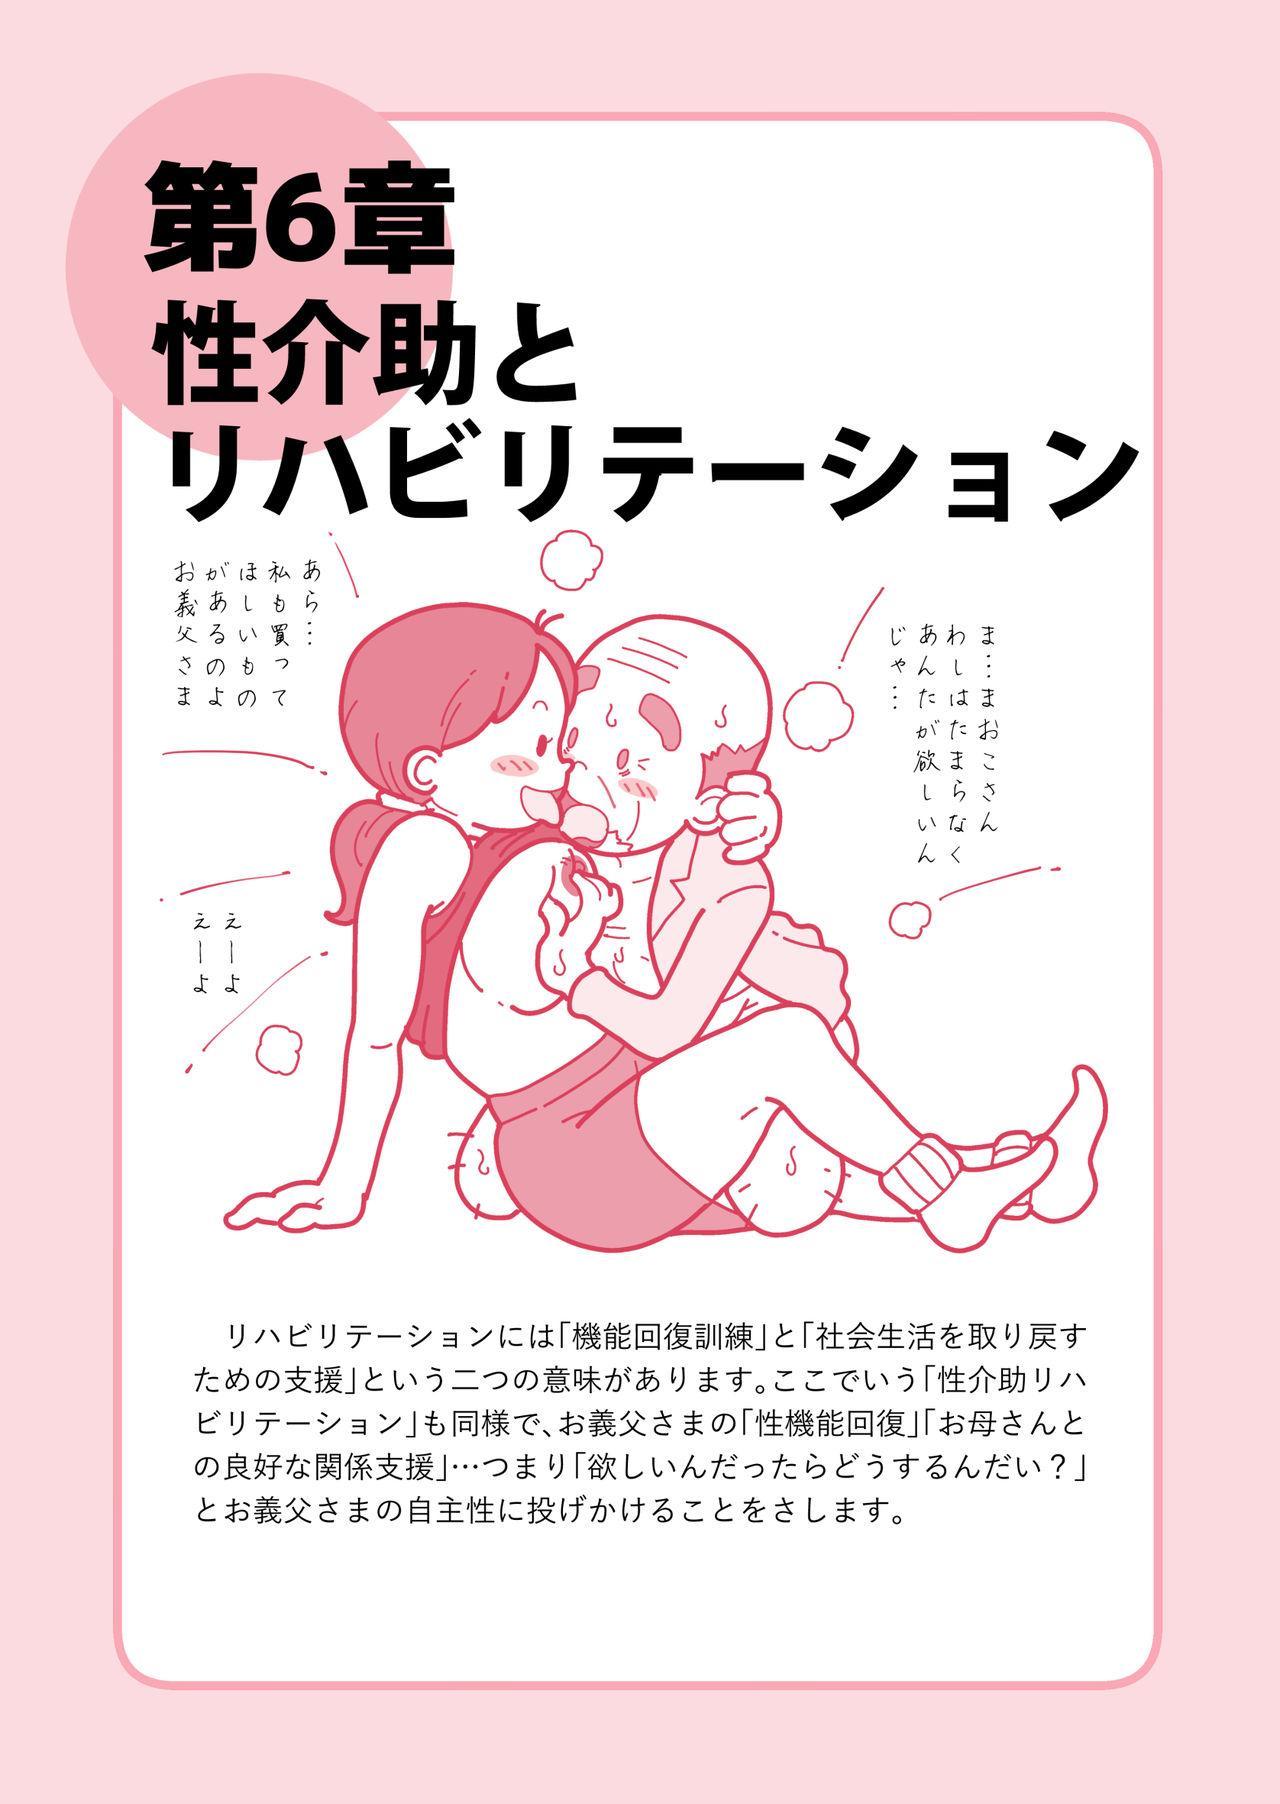 Isogasii Okaasan No Tamuno Sasa Rouzin Seikaigo | Guide for Elderly Sex Health Care to Busy Mom 38